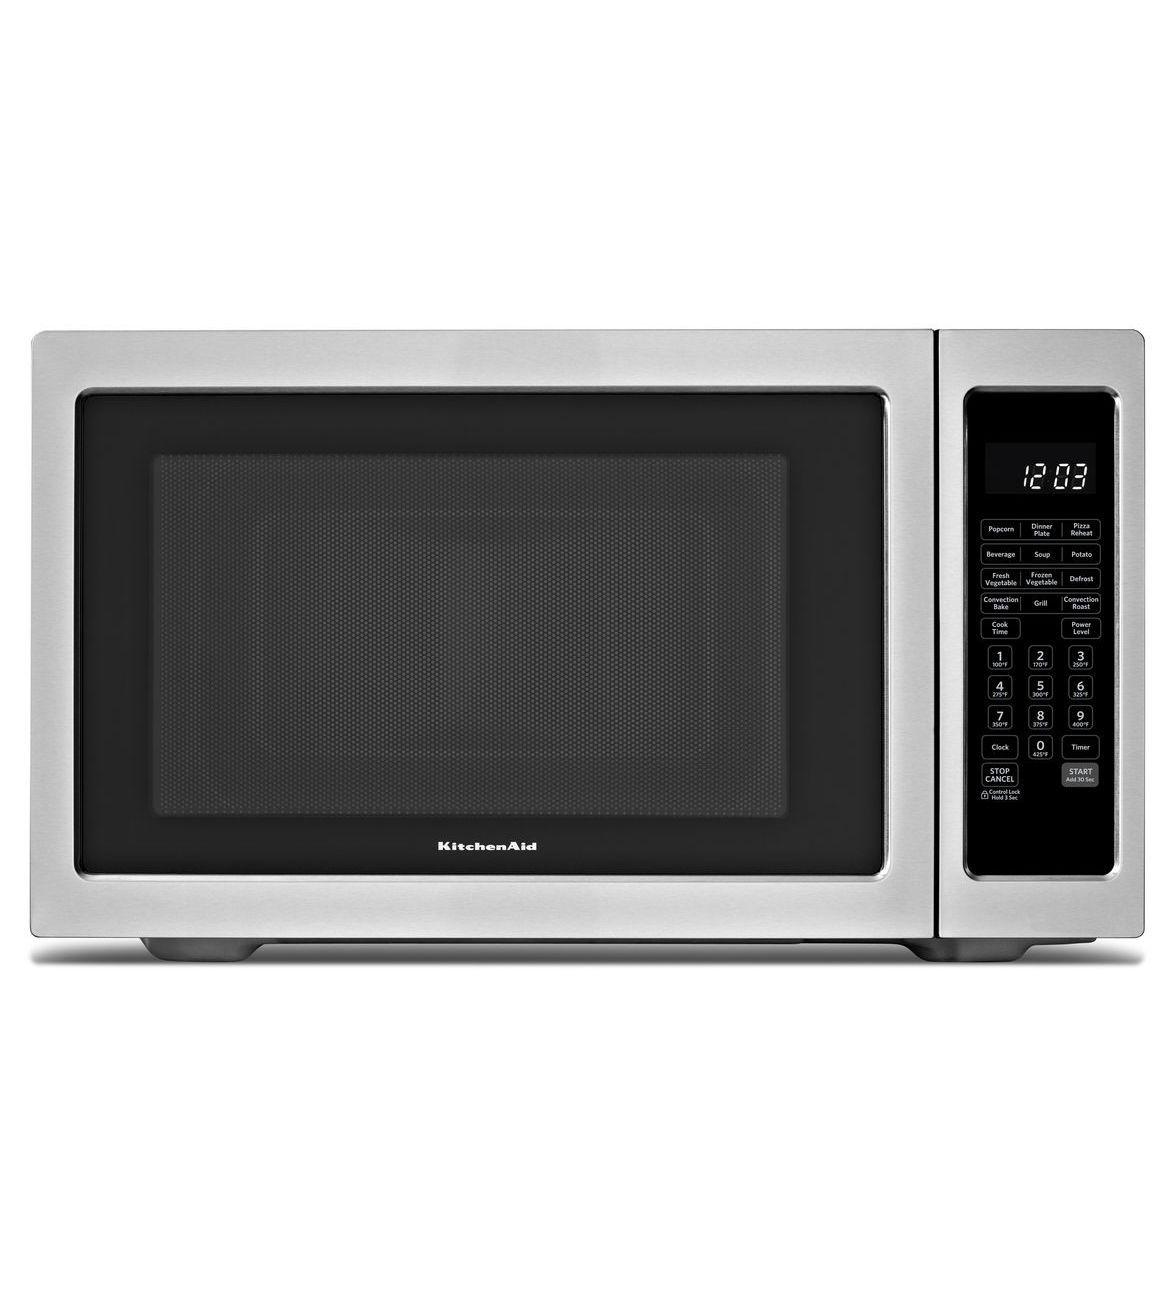 Kitchenaid 1200 Watt Countertop Convection Microwave Oven Architect Series Ii Countertop Microwave Countertop Microwave Oven Stainless Steel Microwave